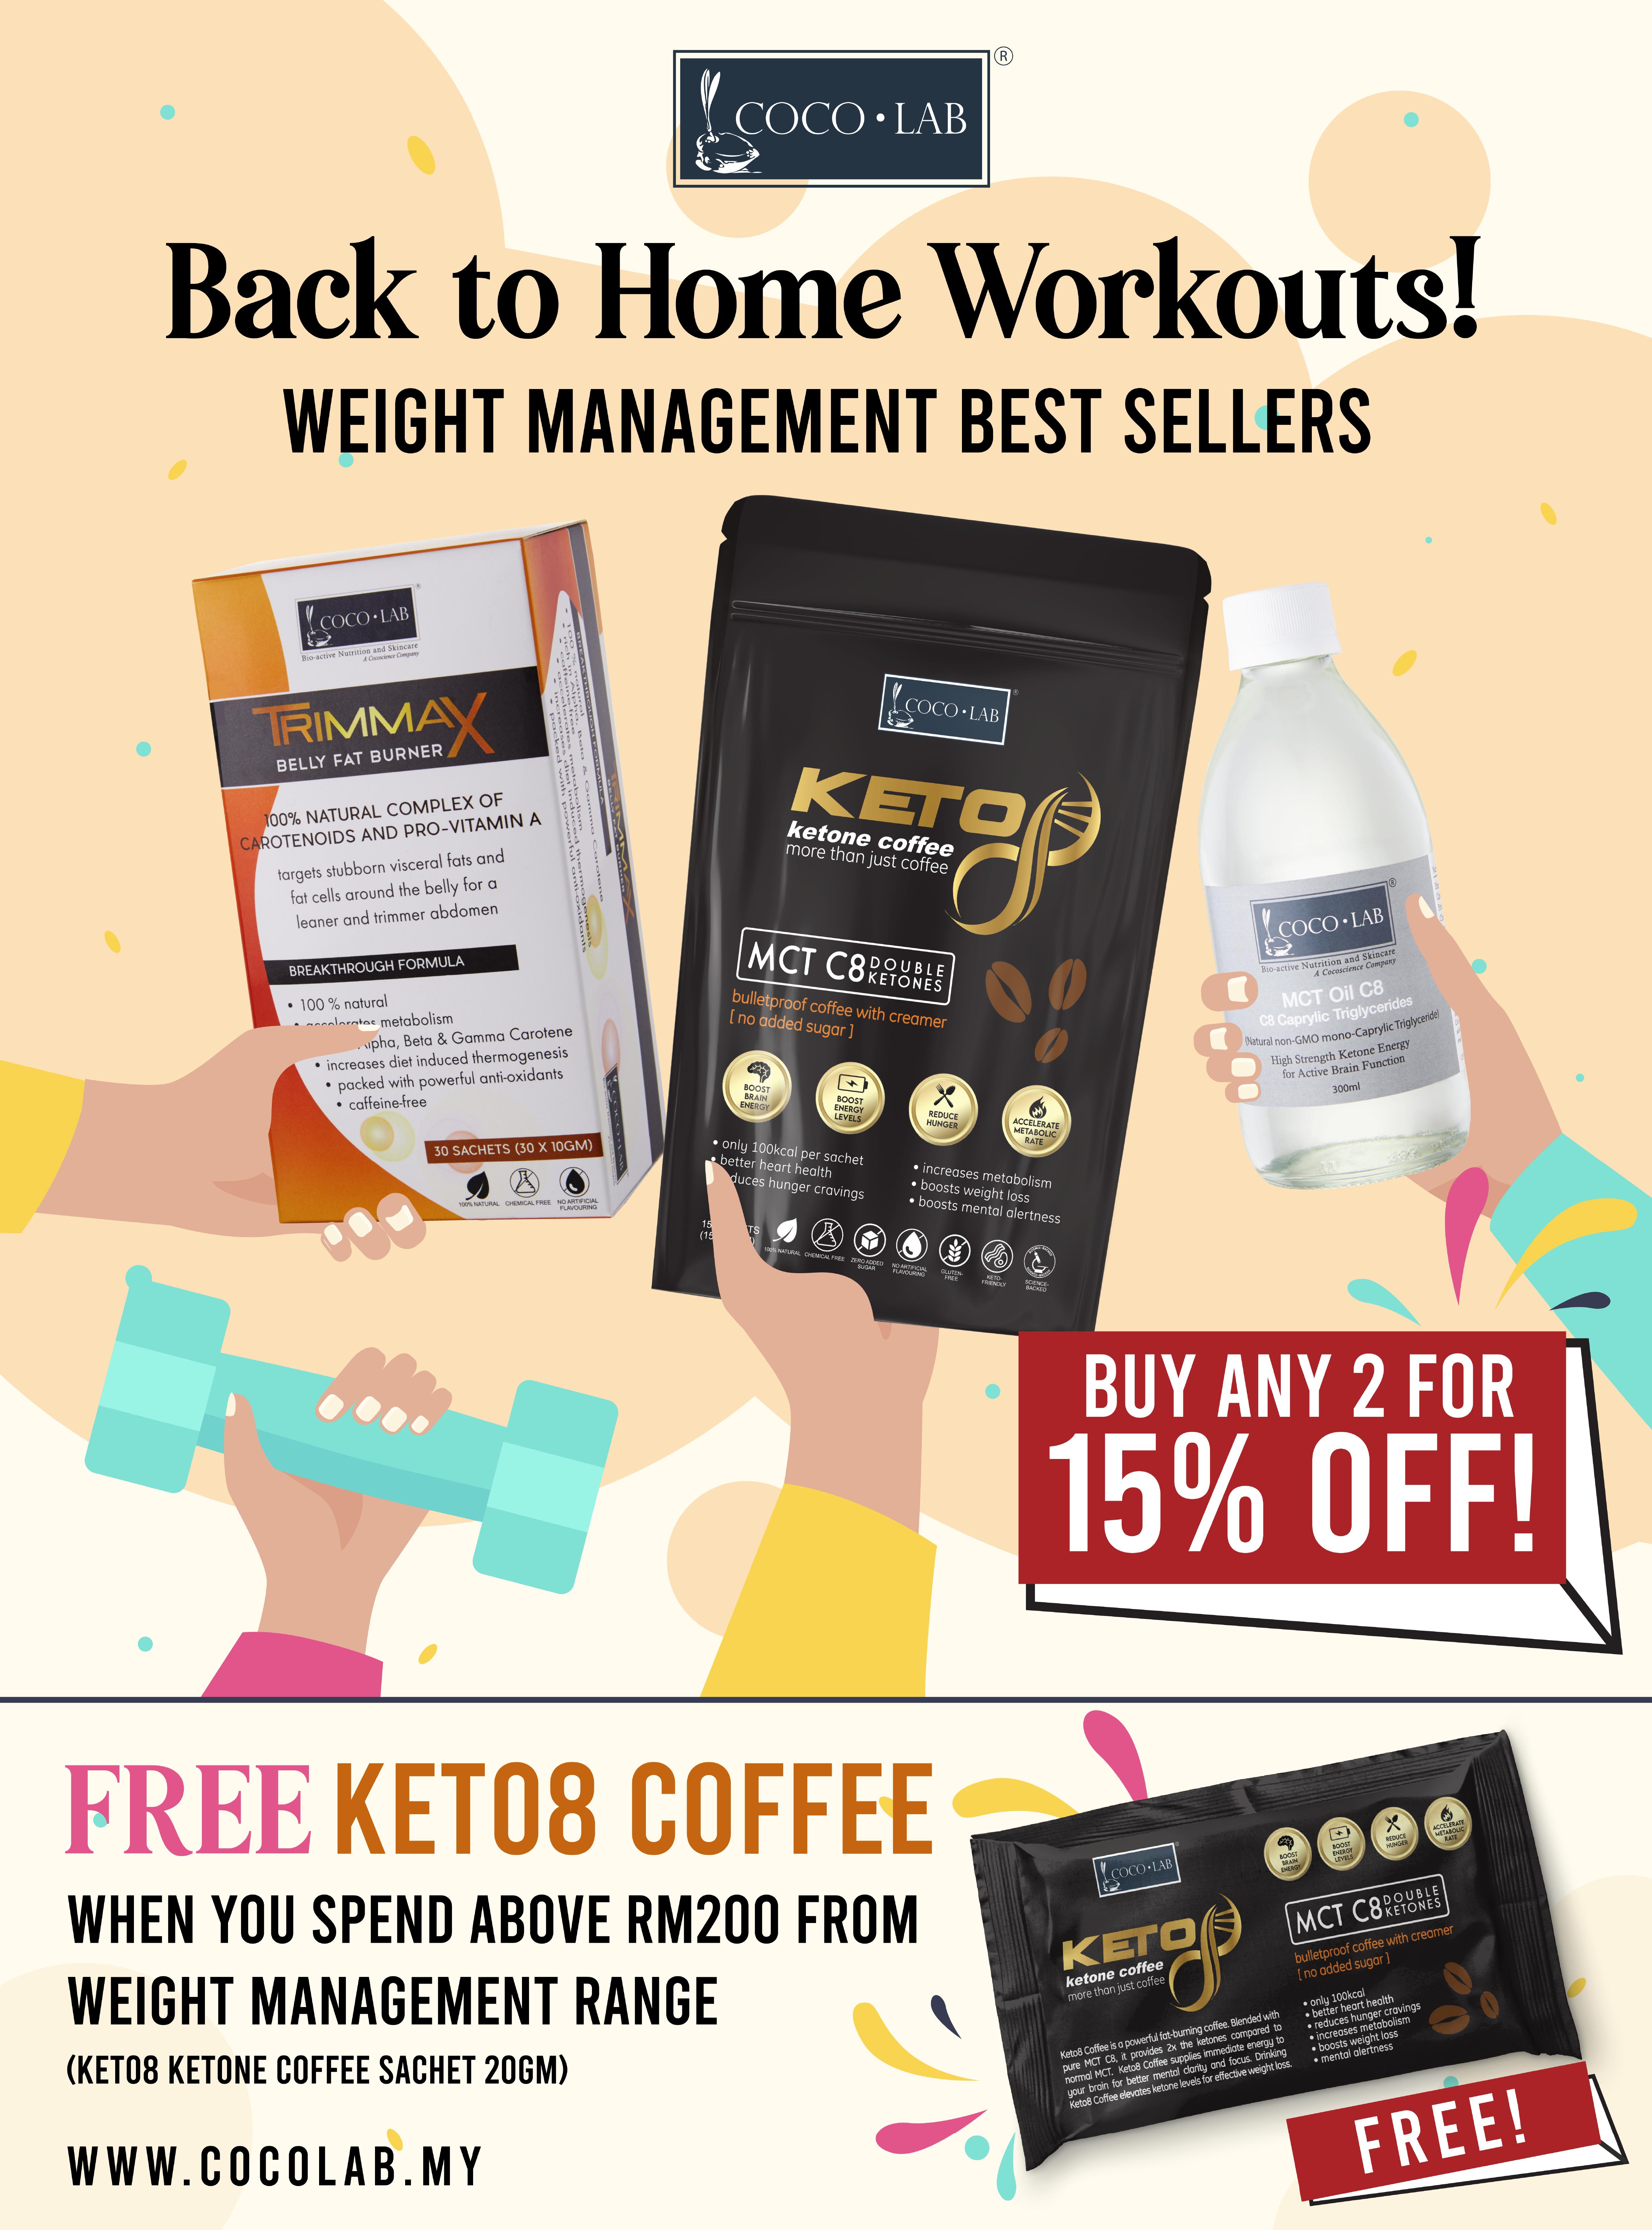 15% OFF Weight Management Range plus Free Keto8 Coffee!